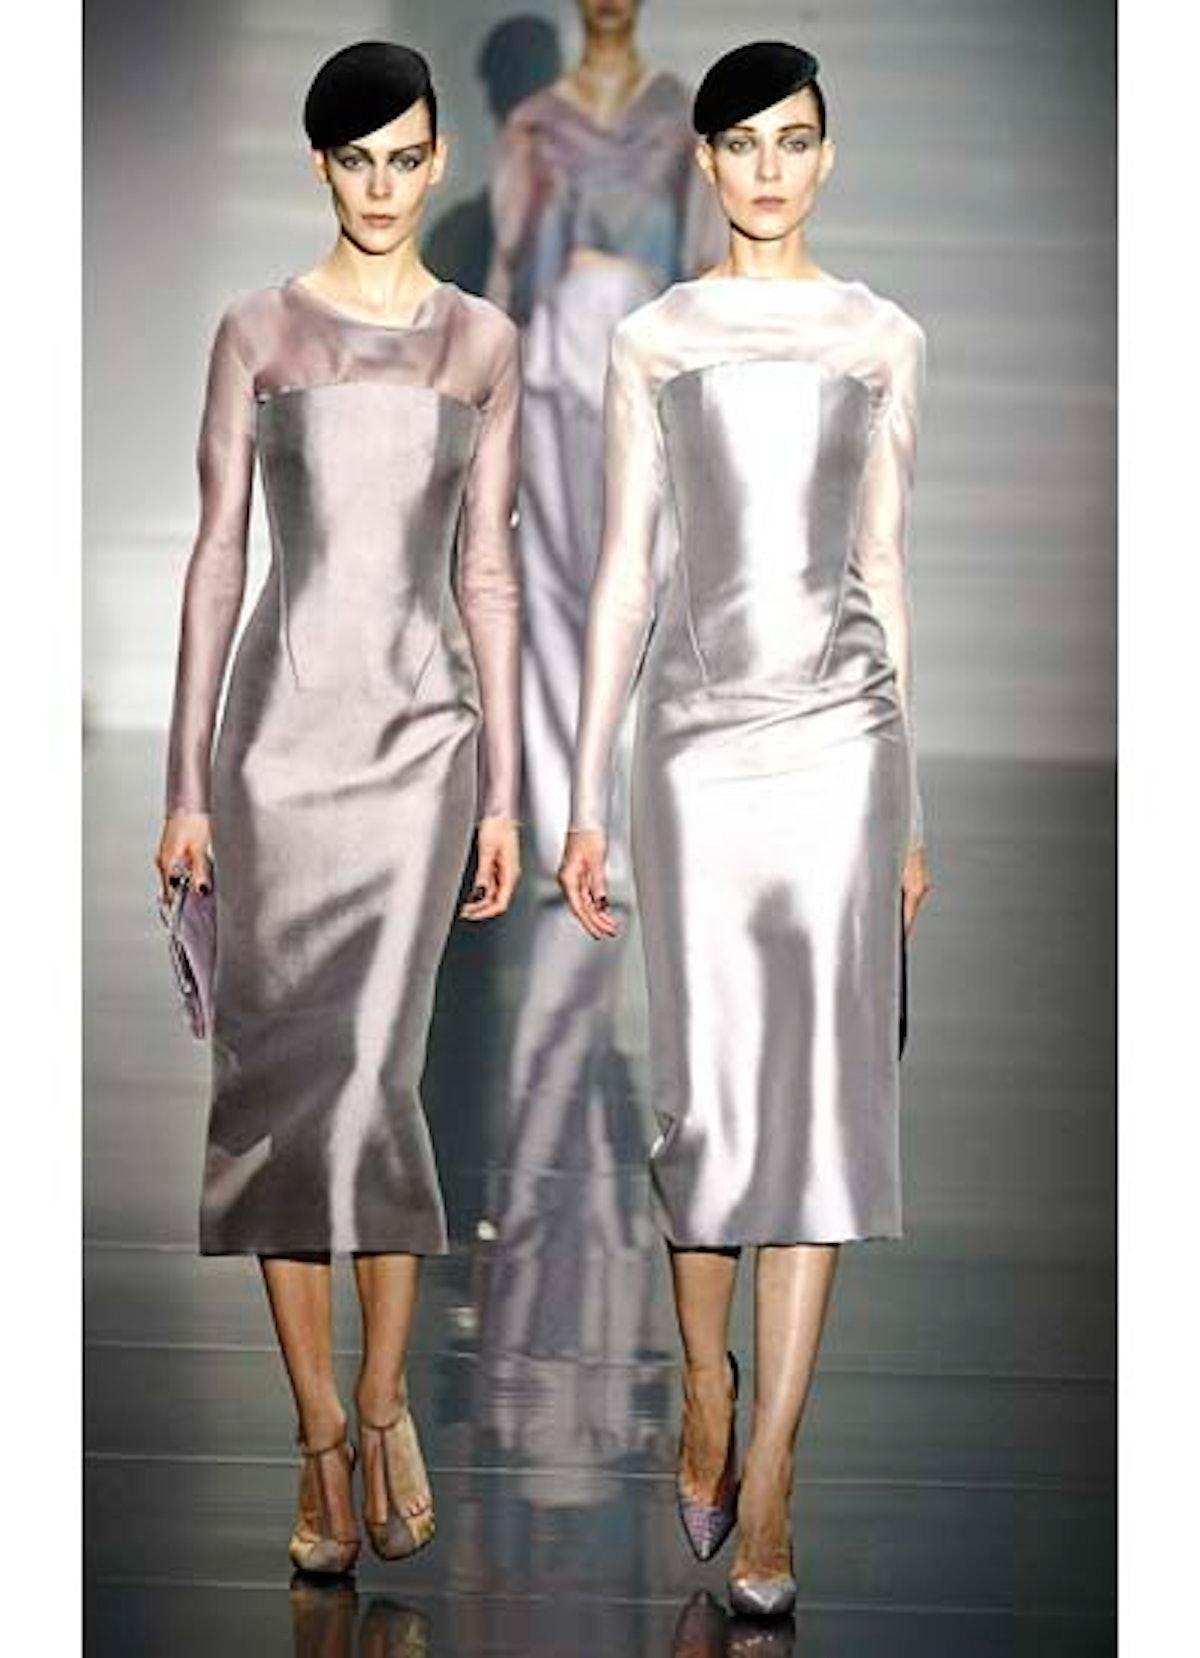 fass-giorgio-armani-couture-2012-runway-15-v.jpg